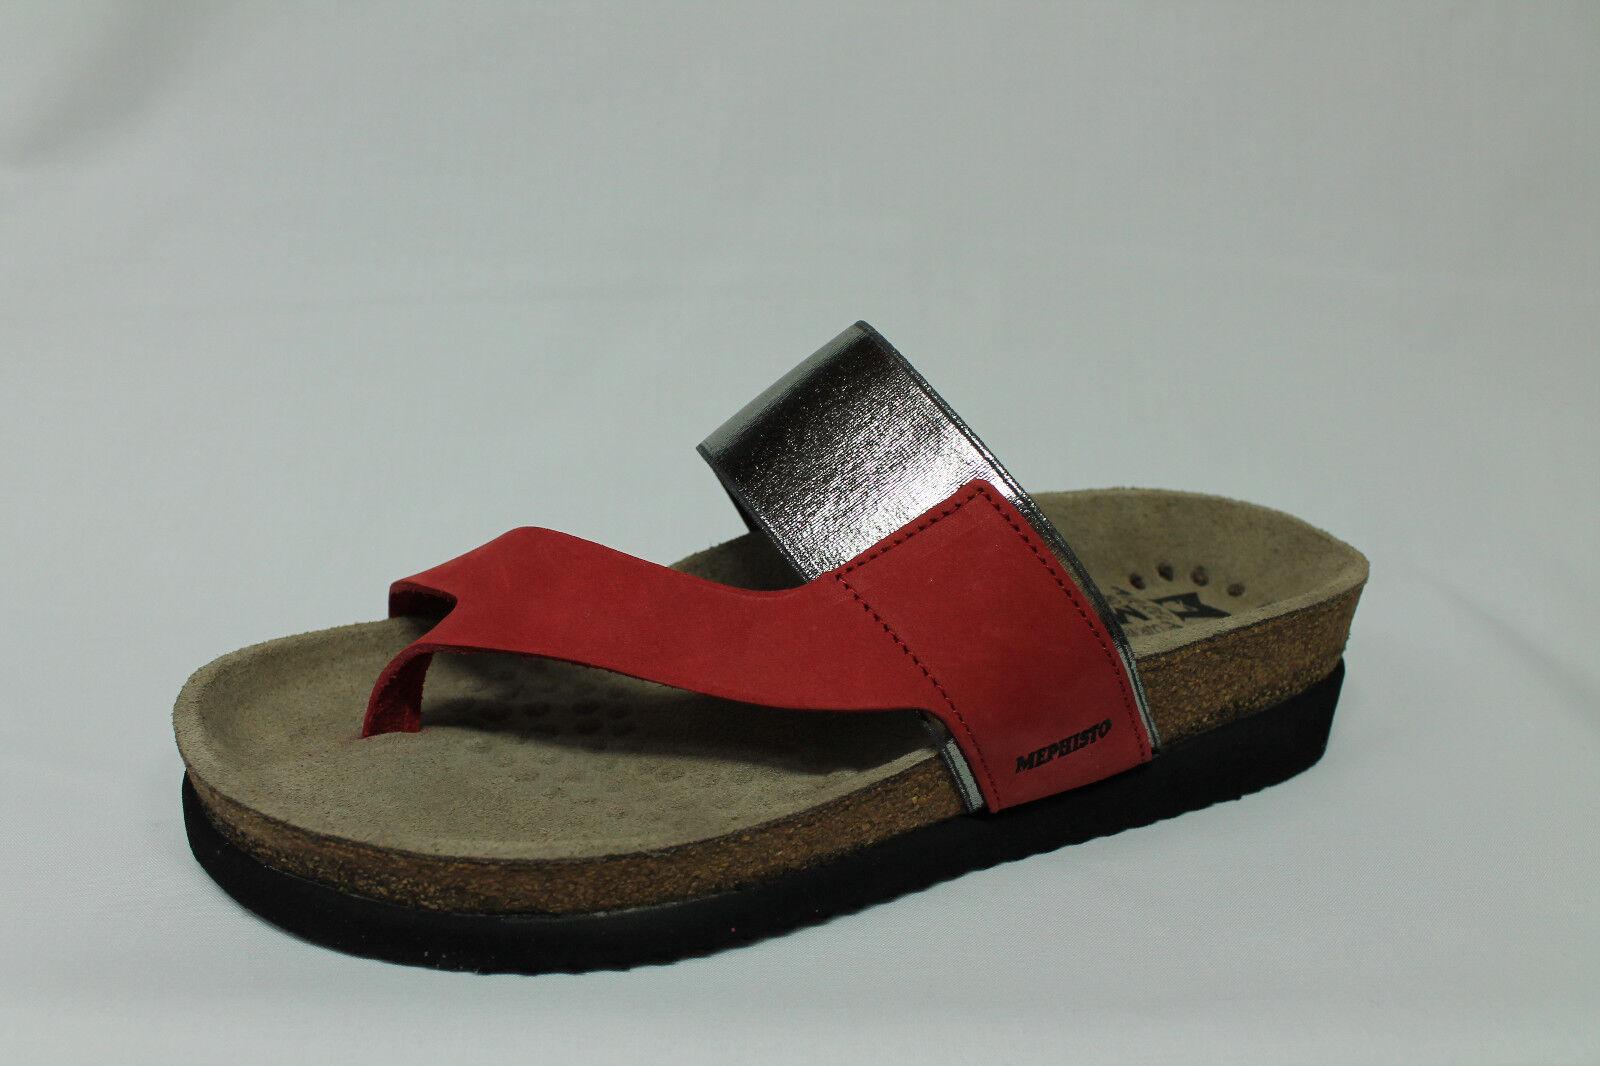 Ciabatte sandali infradito Mephisto Hubilia Birkenstock nabuck rosso tipo Birkenstock Hubilia 33ecb8